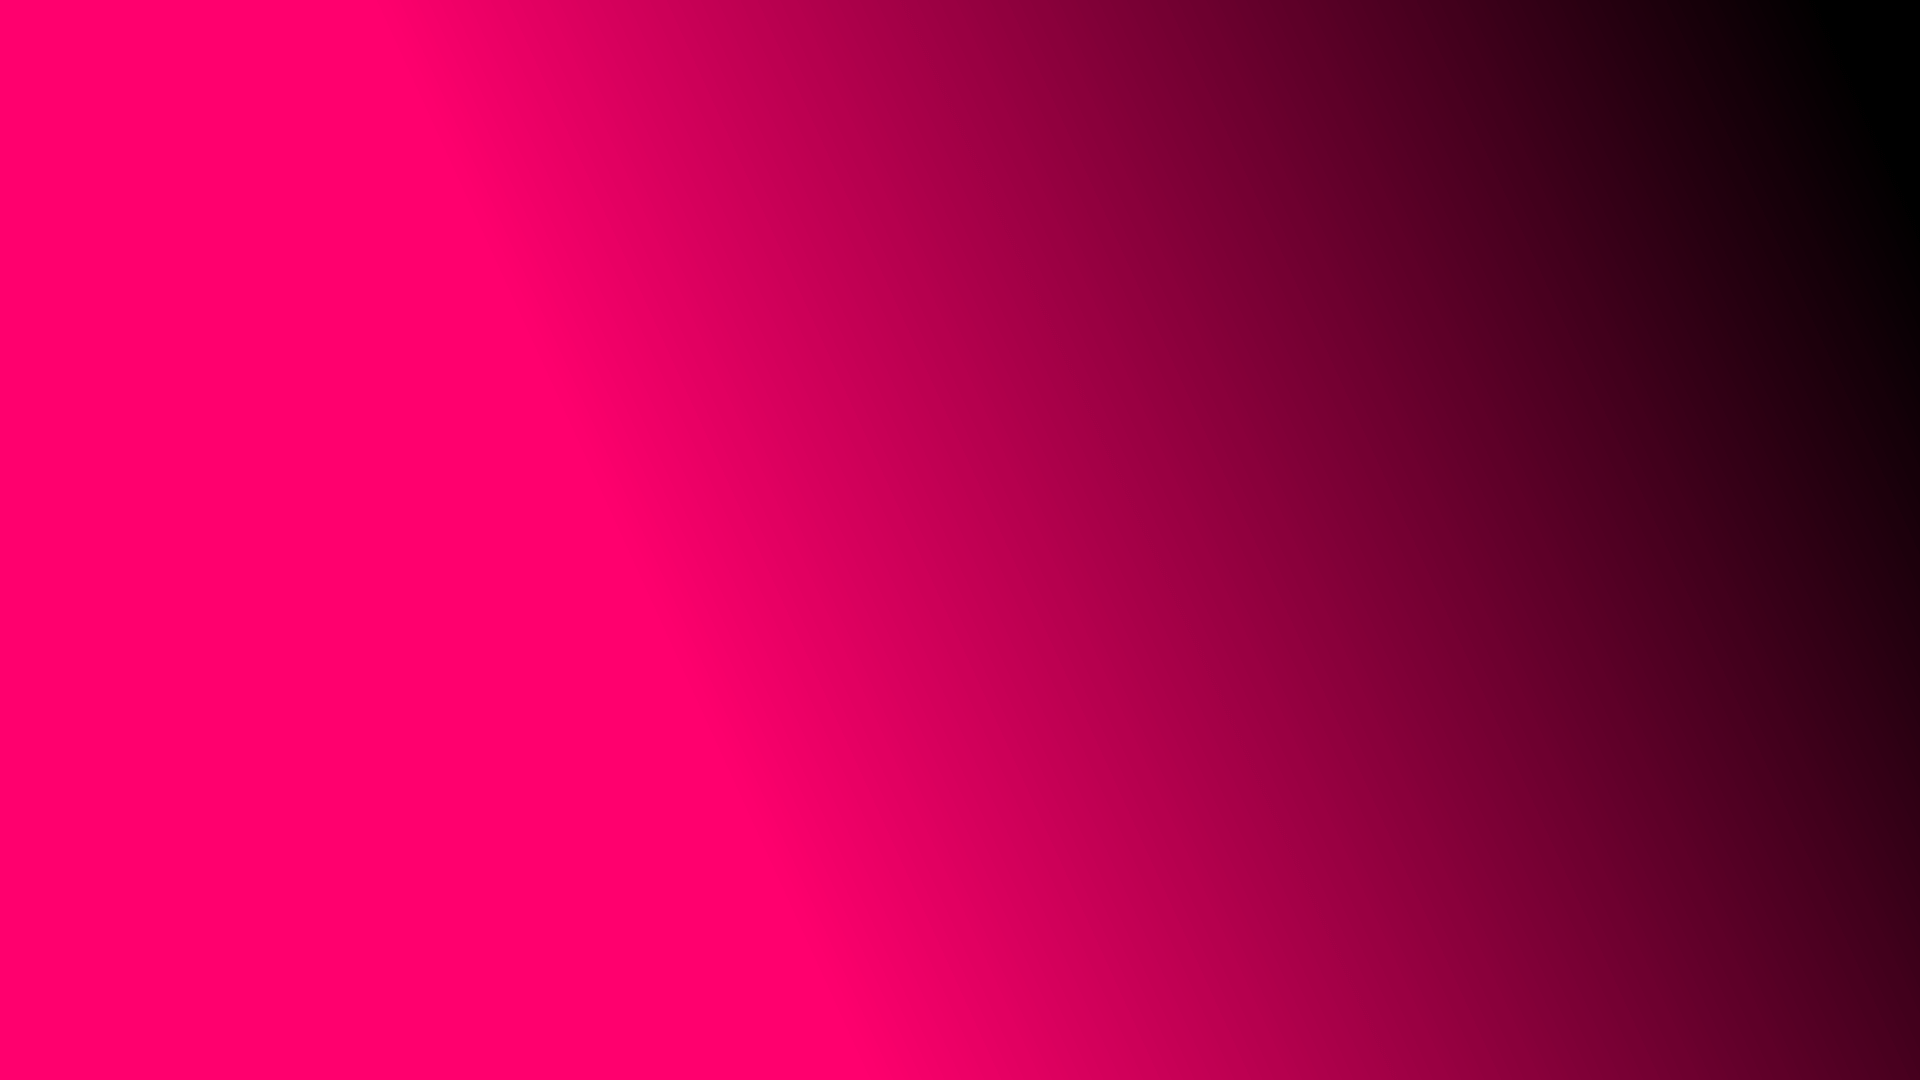 Nothing found for Pink black gradient desktop wallpaper 1920x1080